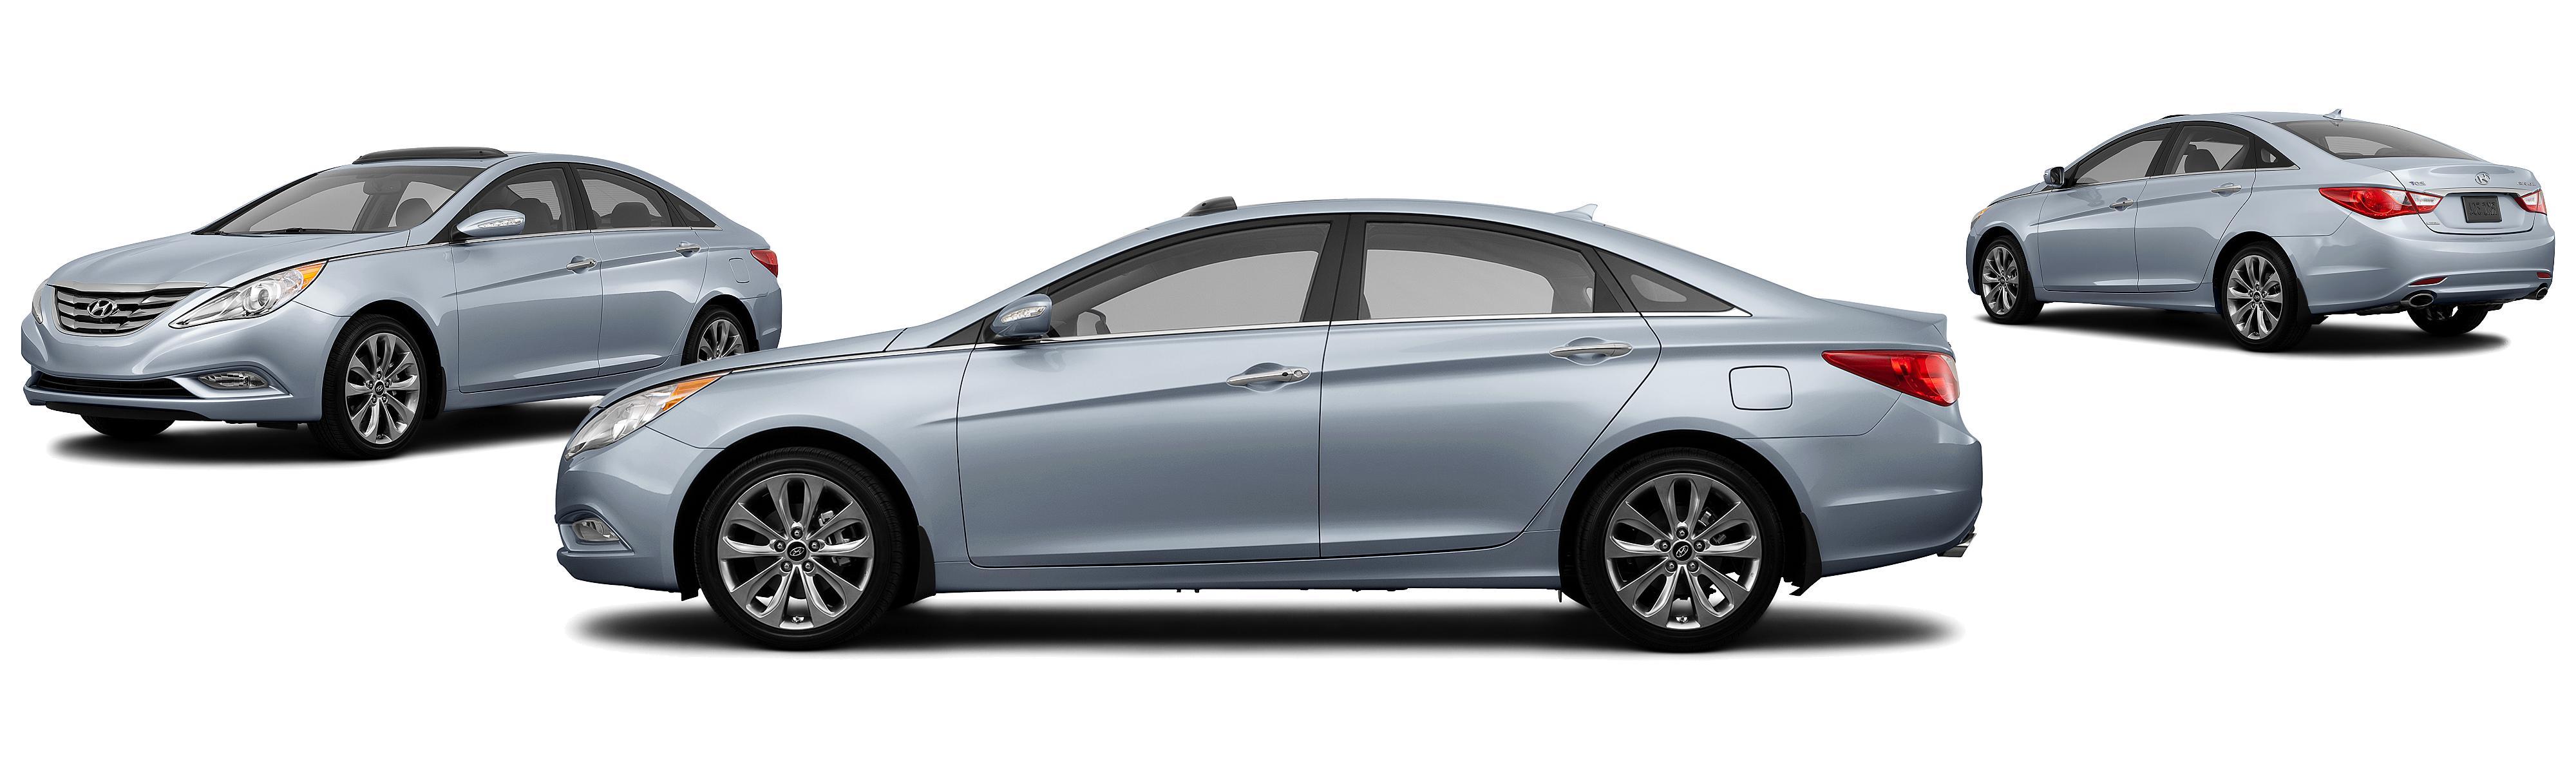 2011 Hyundai Sonata Limited 2 0T 4dr Sedan w/ Wine Interior